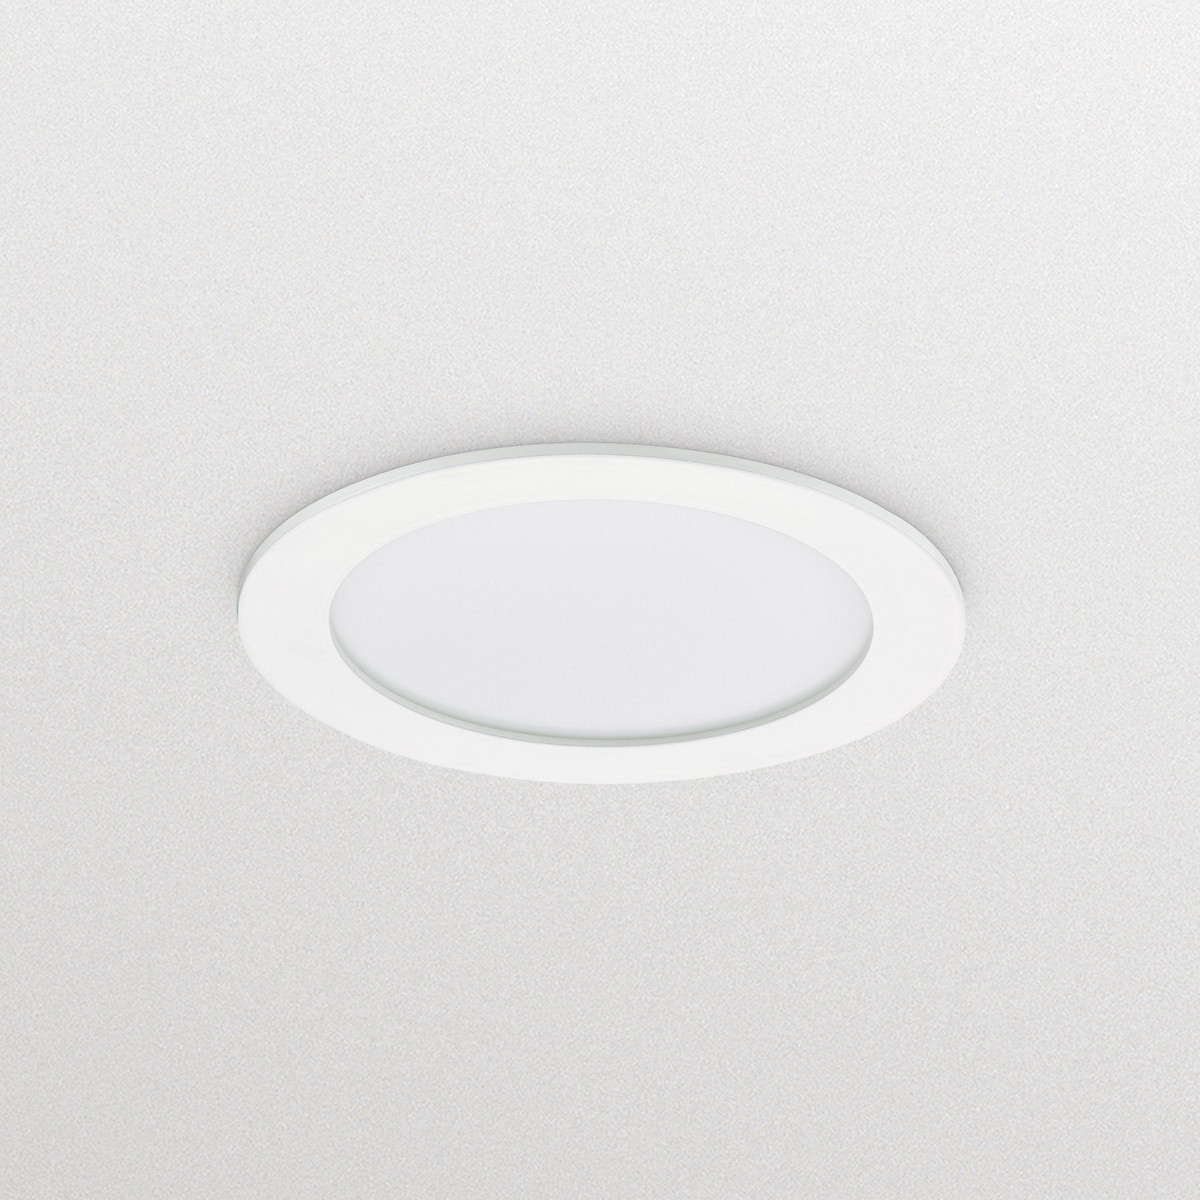 Philips CoreLine SlimDownlight Gen3 Indbyg DN145B 1100lm/830 11W Hvid